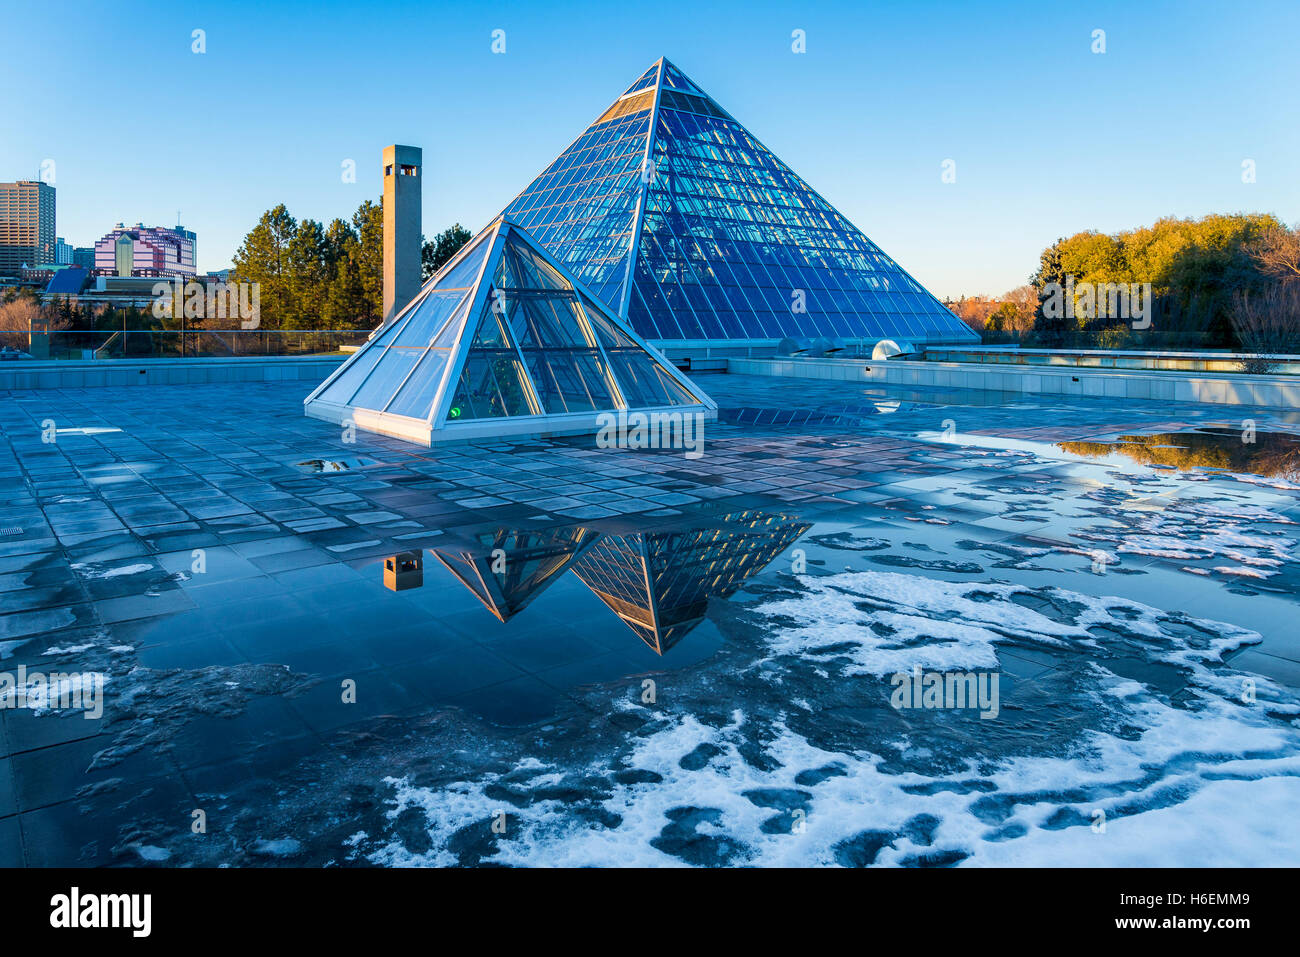 Muttart Conservatory Pyramiden, einen botanischen Garten in Edmonton, Alberta, Kanada Stockbild